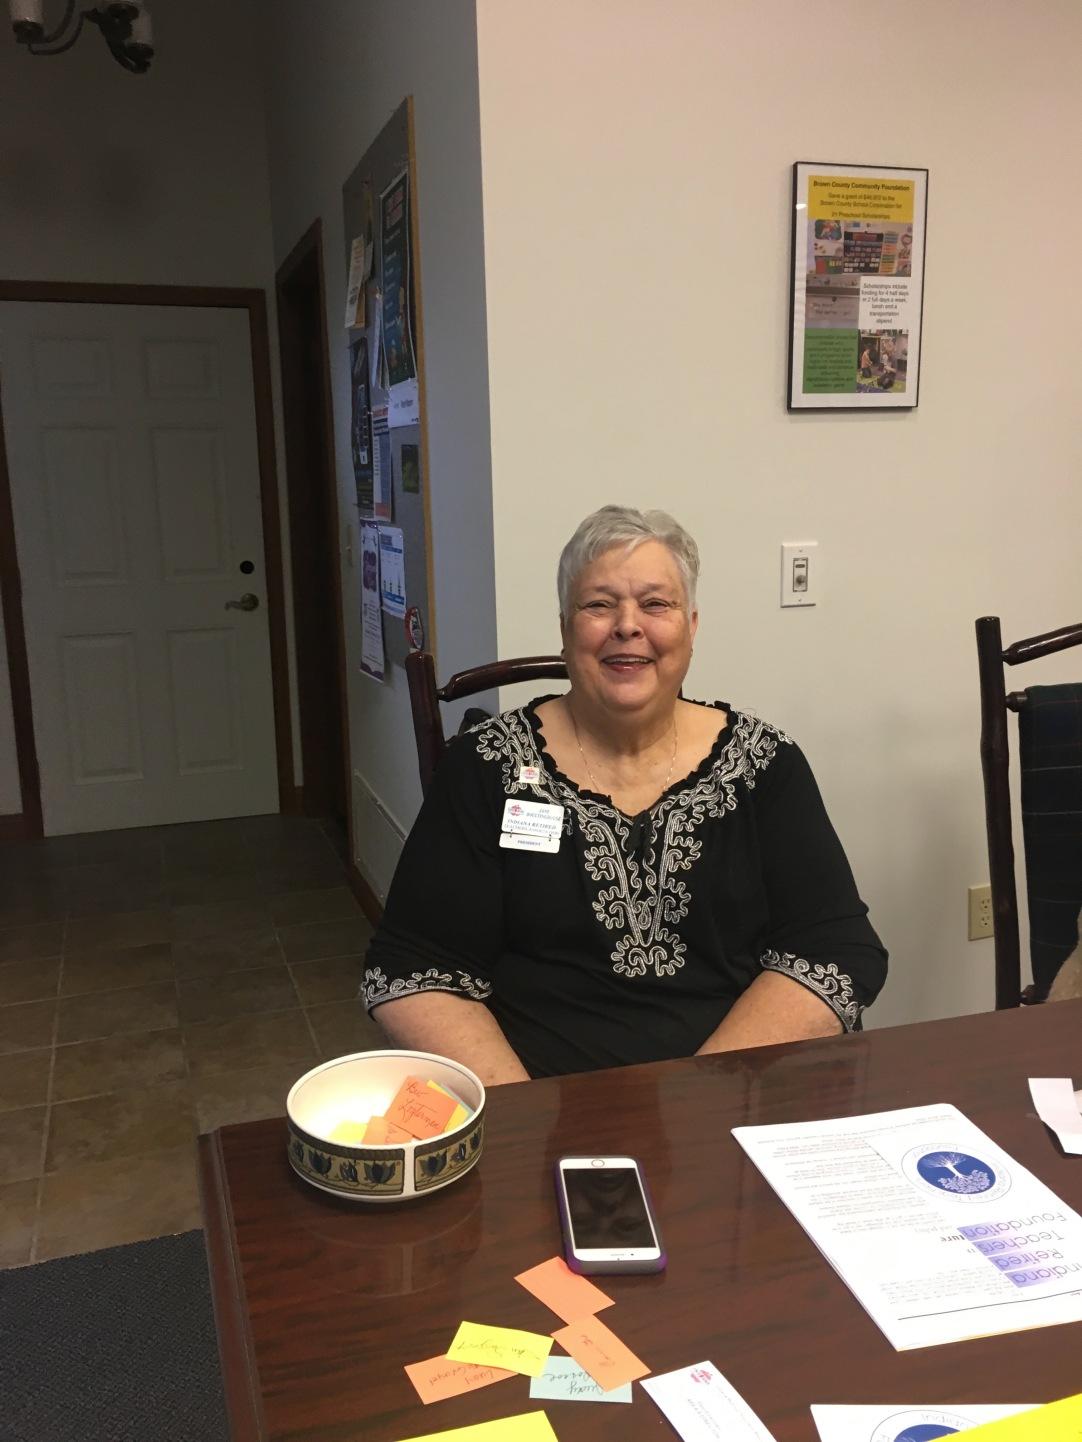 IRTA President Jane Boultinghouse from Spencer County